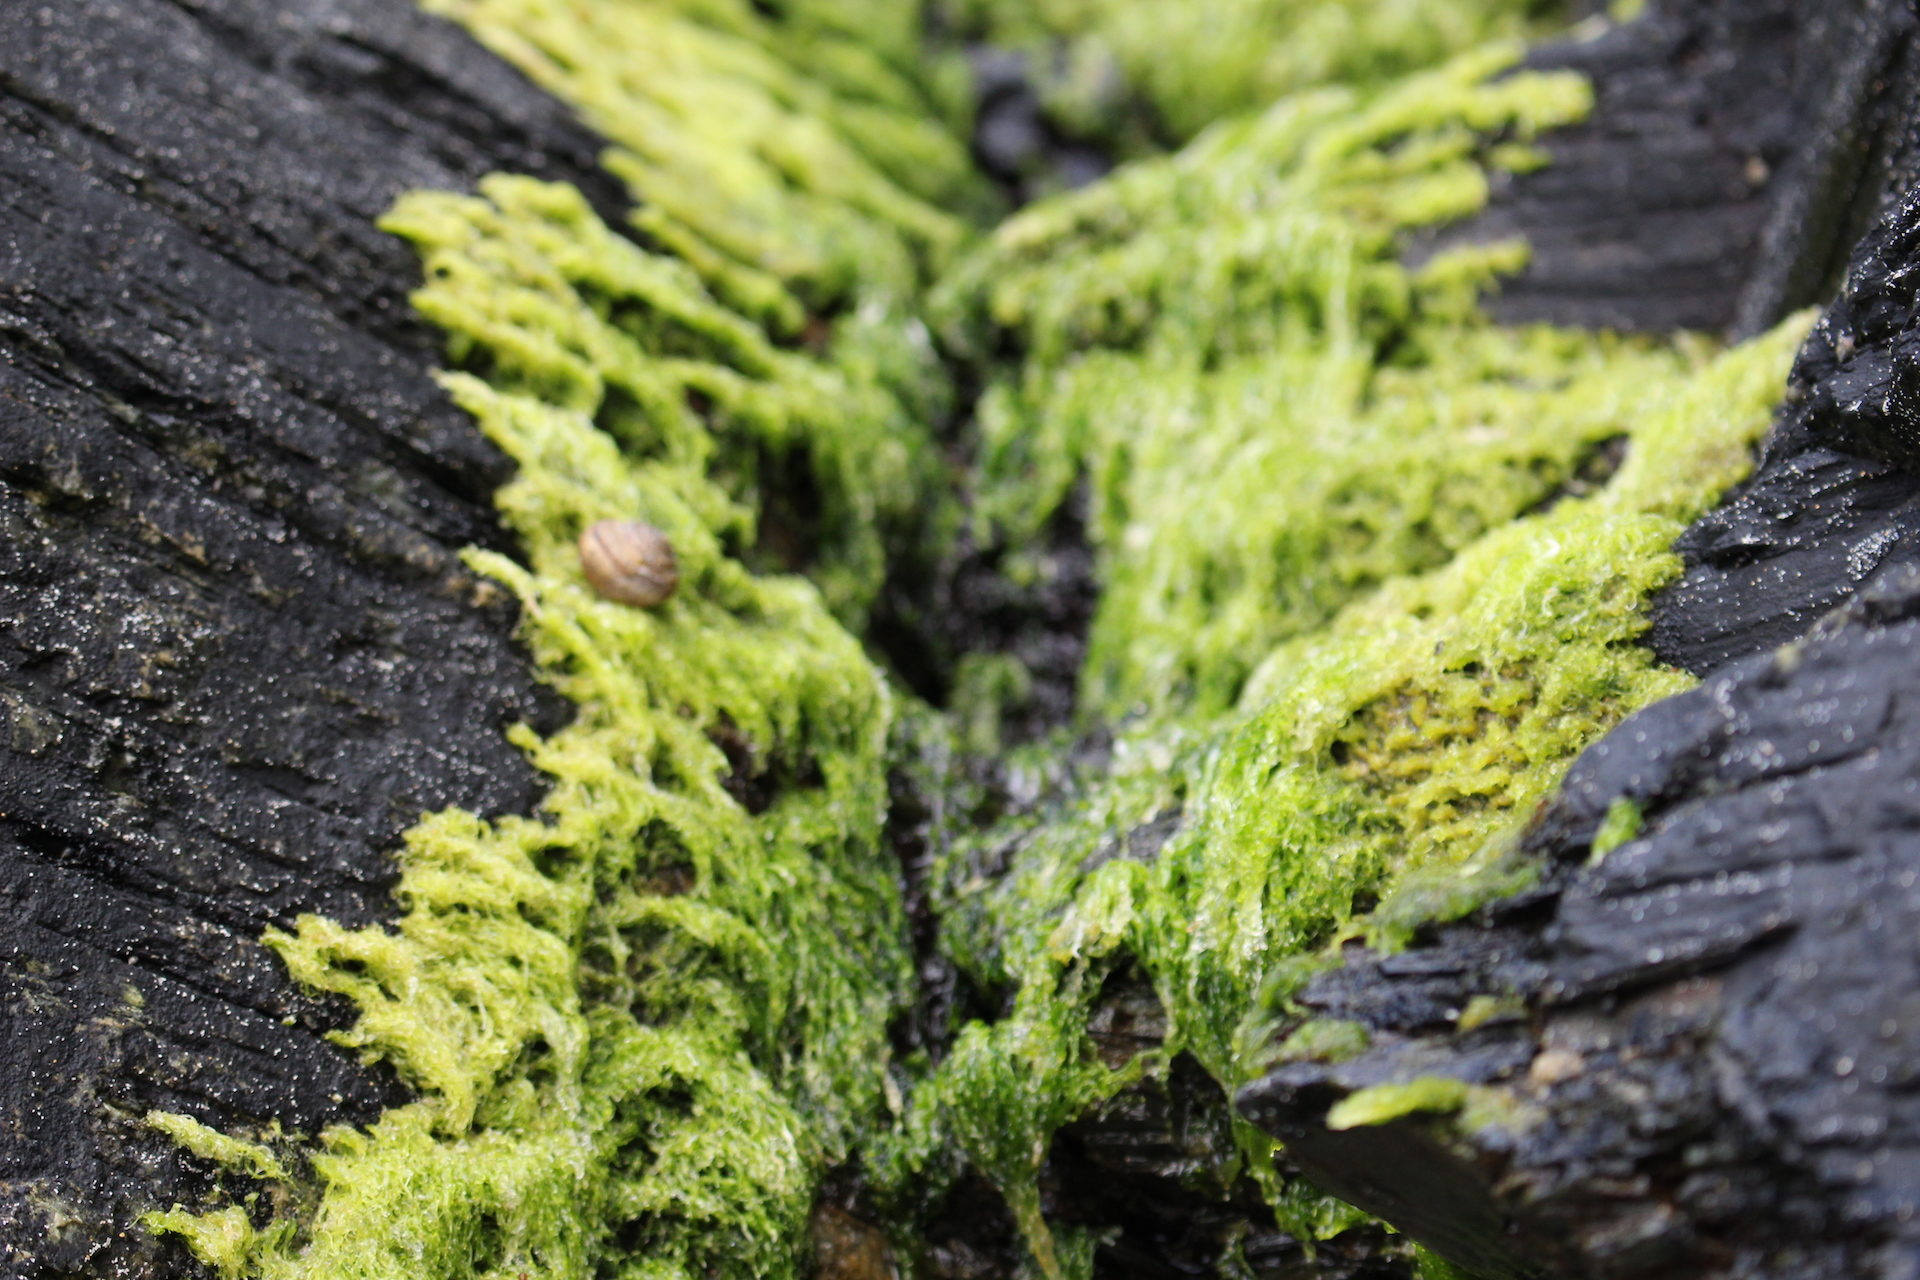 algas, pedras, caracol, Praia, Verde - Papéis de parede HD - Professor-falken.com